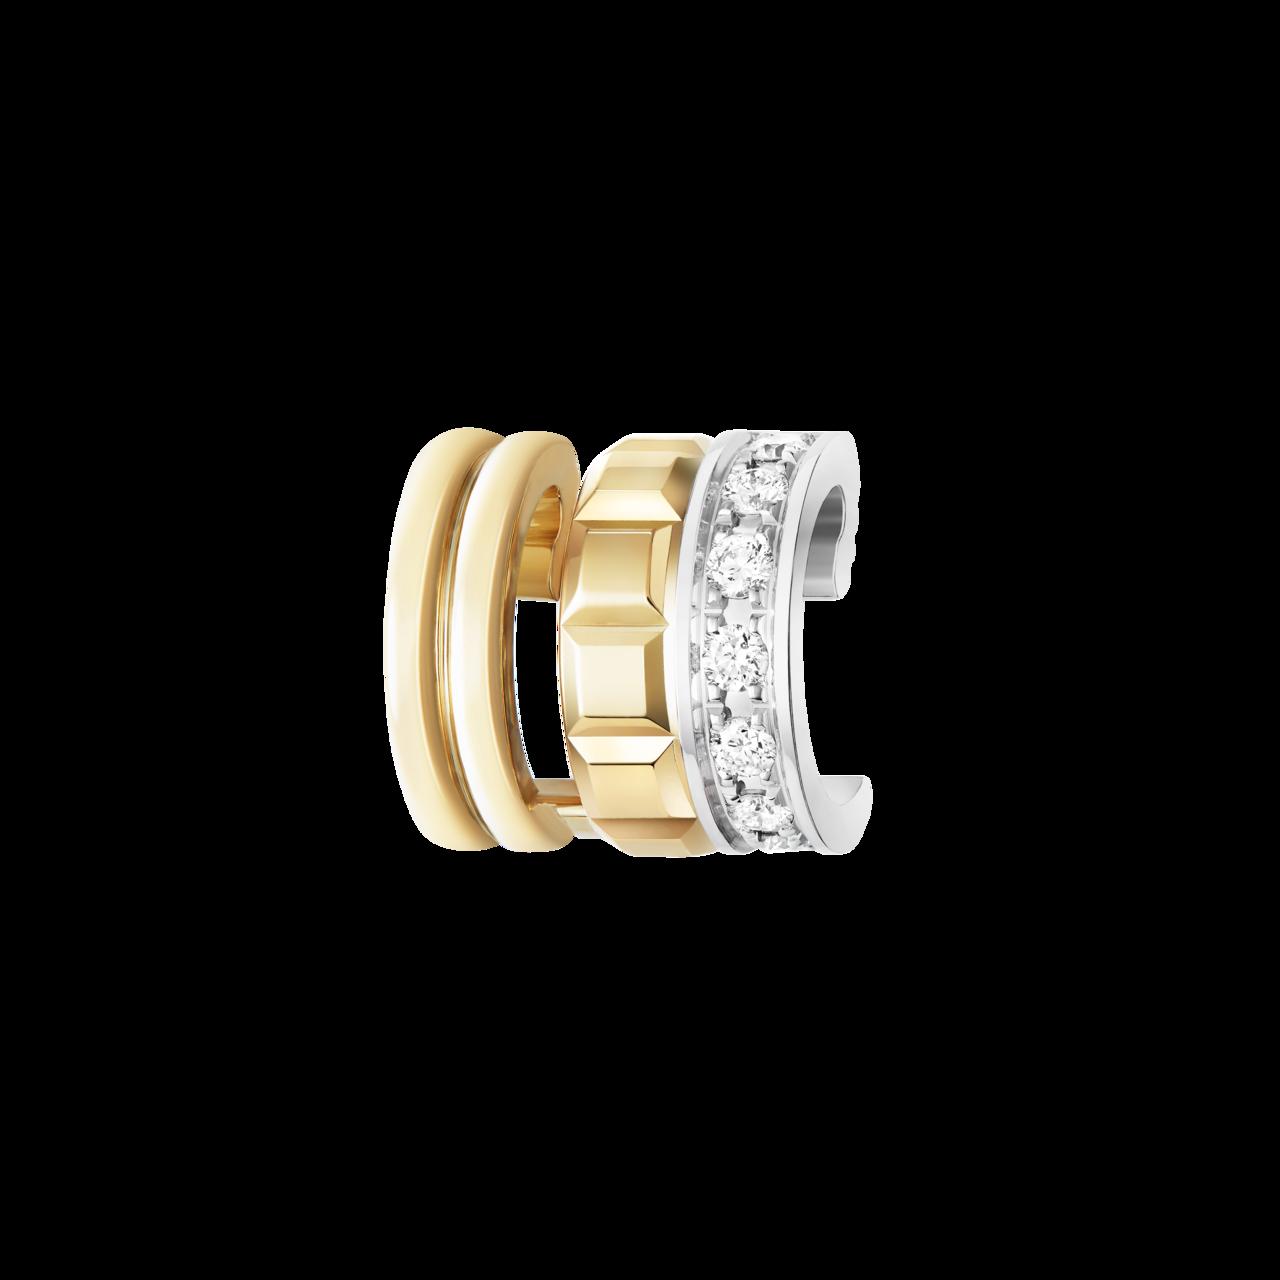 Quatre系列耳夾,18K黃金與白金鑲嵌7顆圓鑽,89,000元。圖/寶詩龍提...